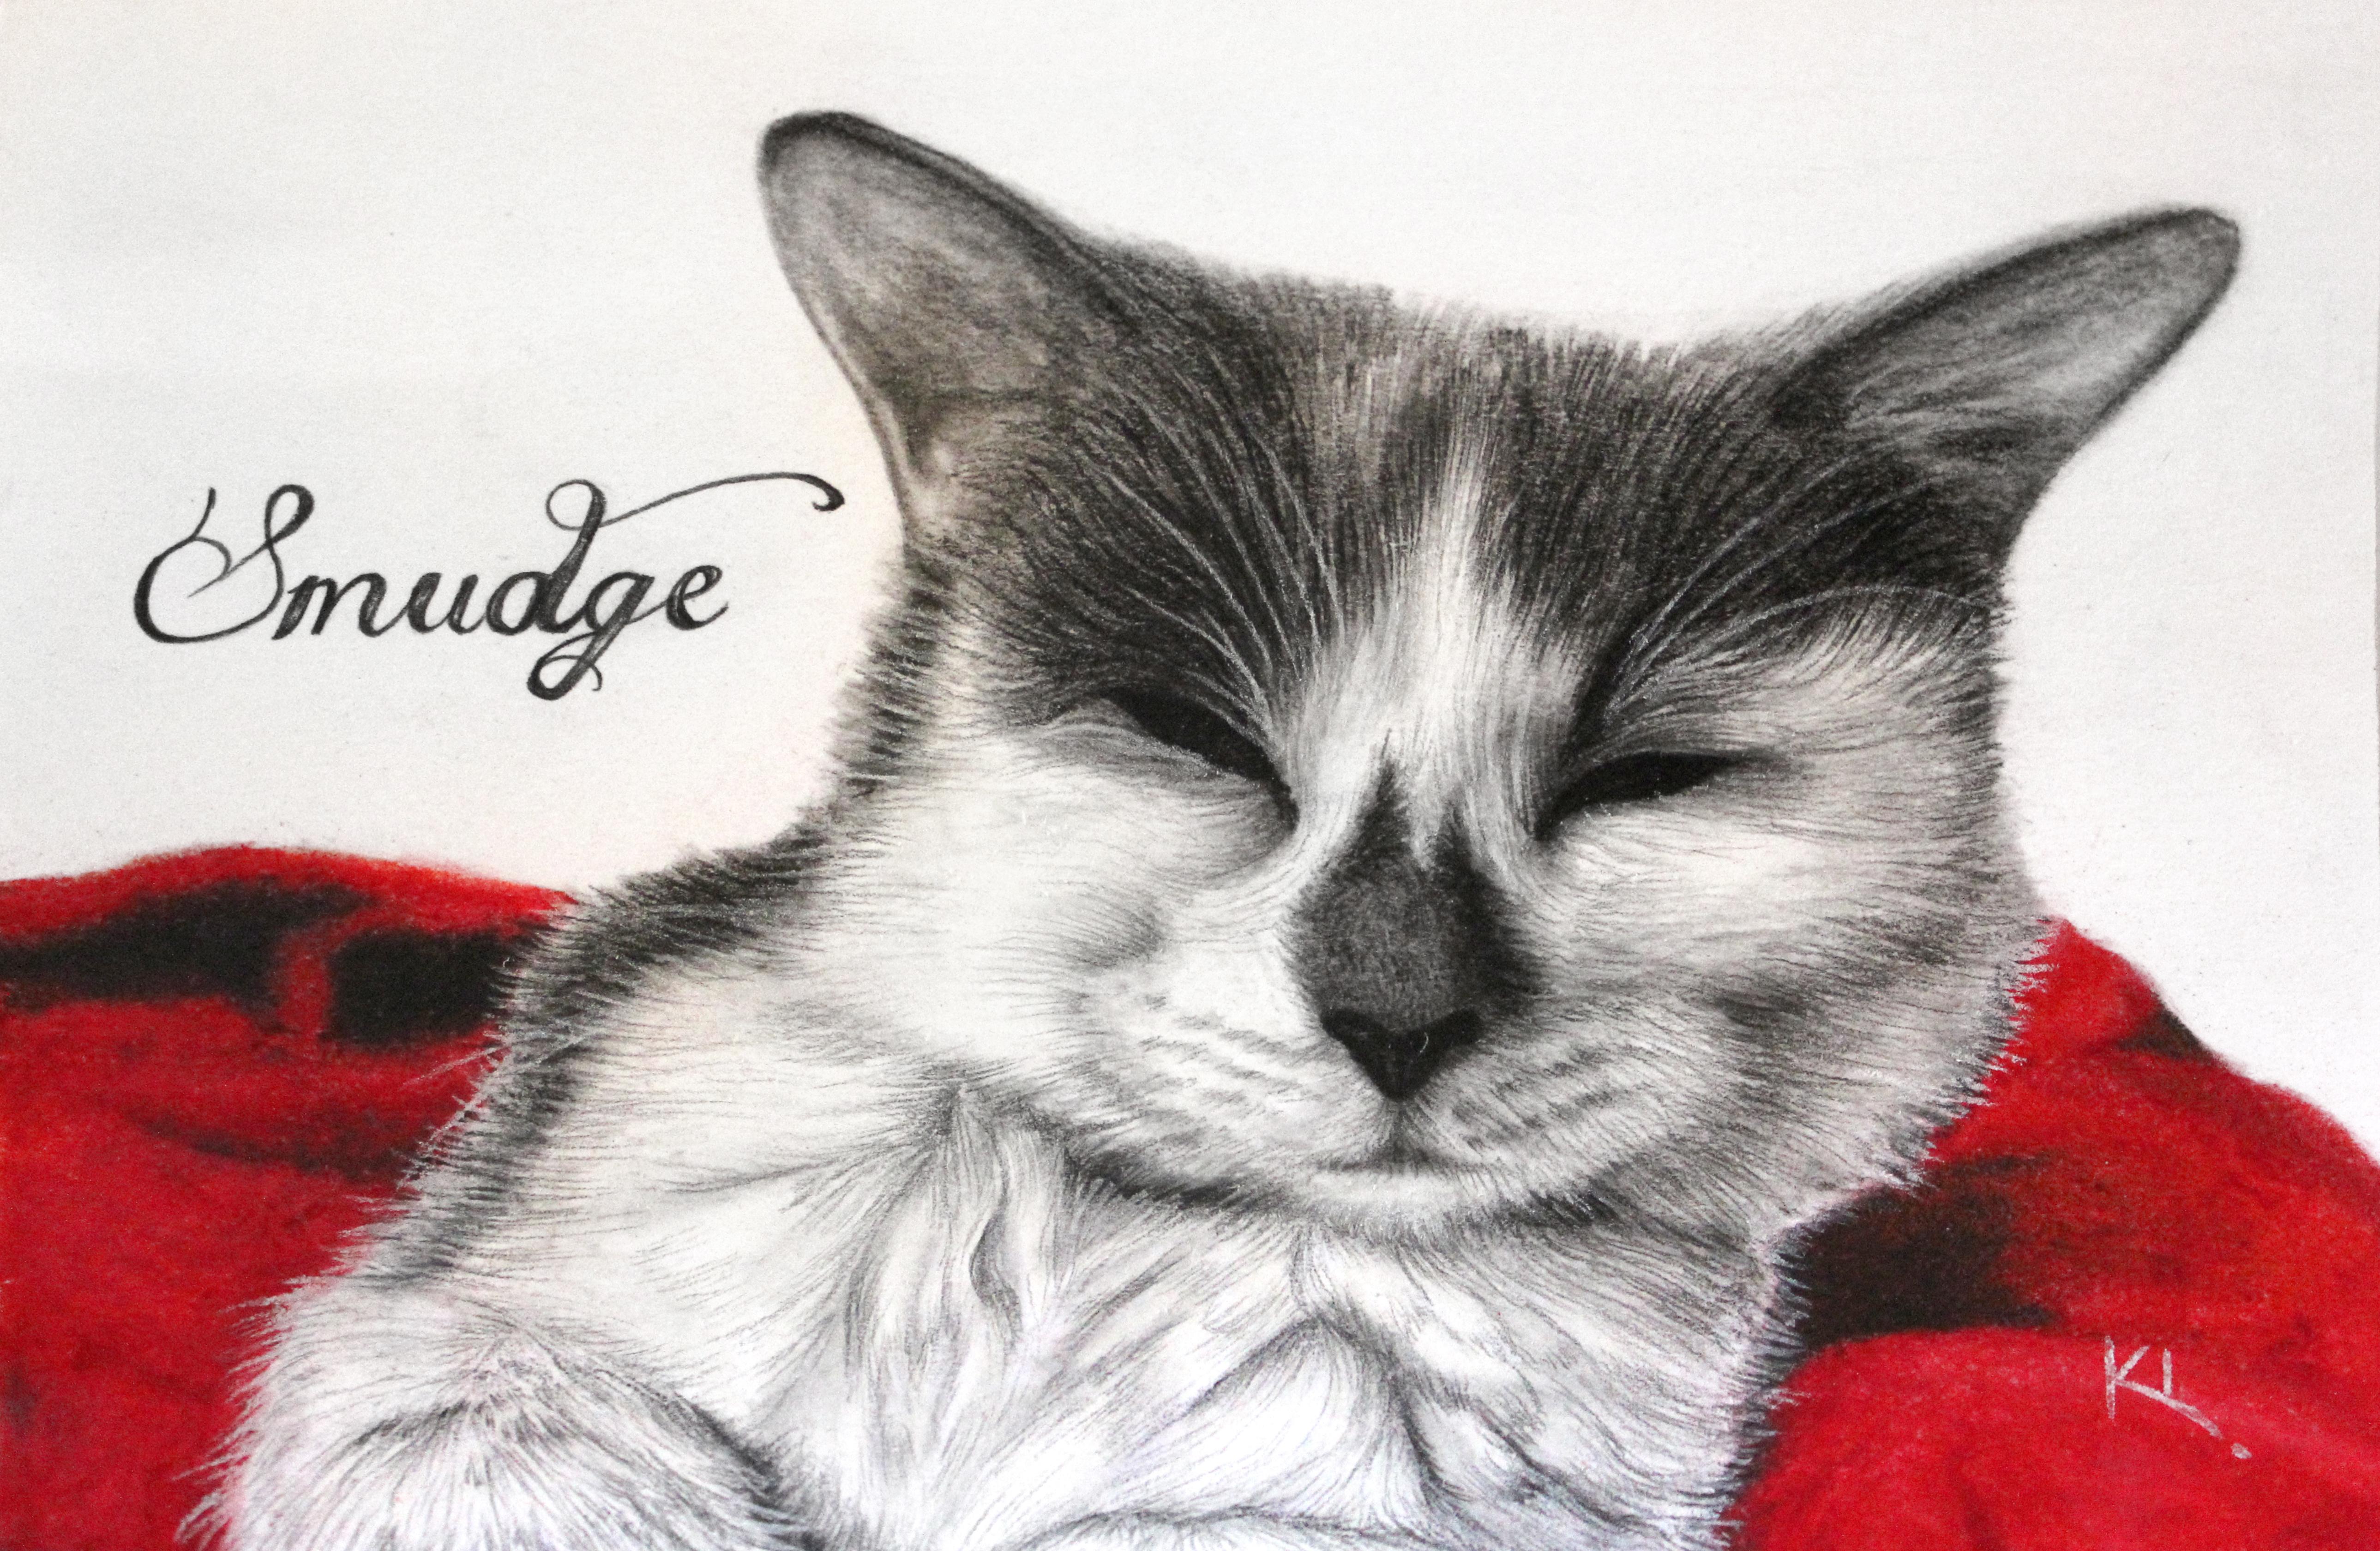 'Smudge'